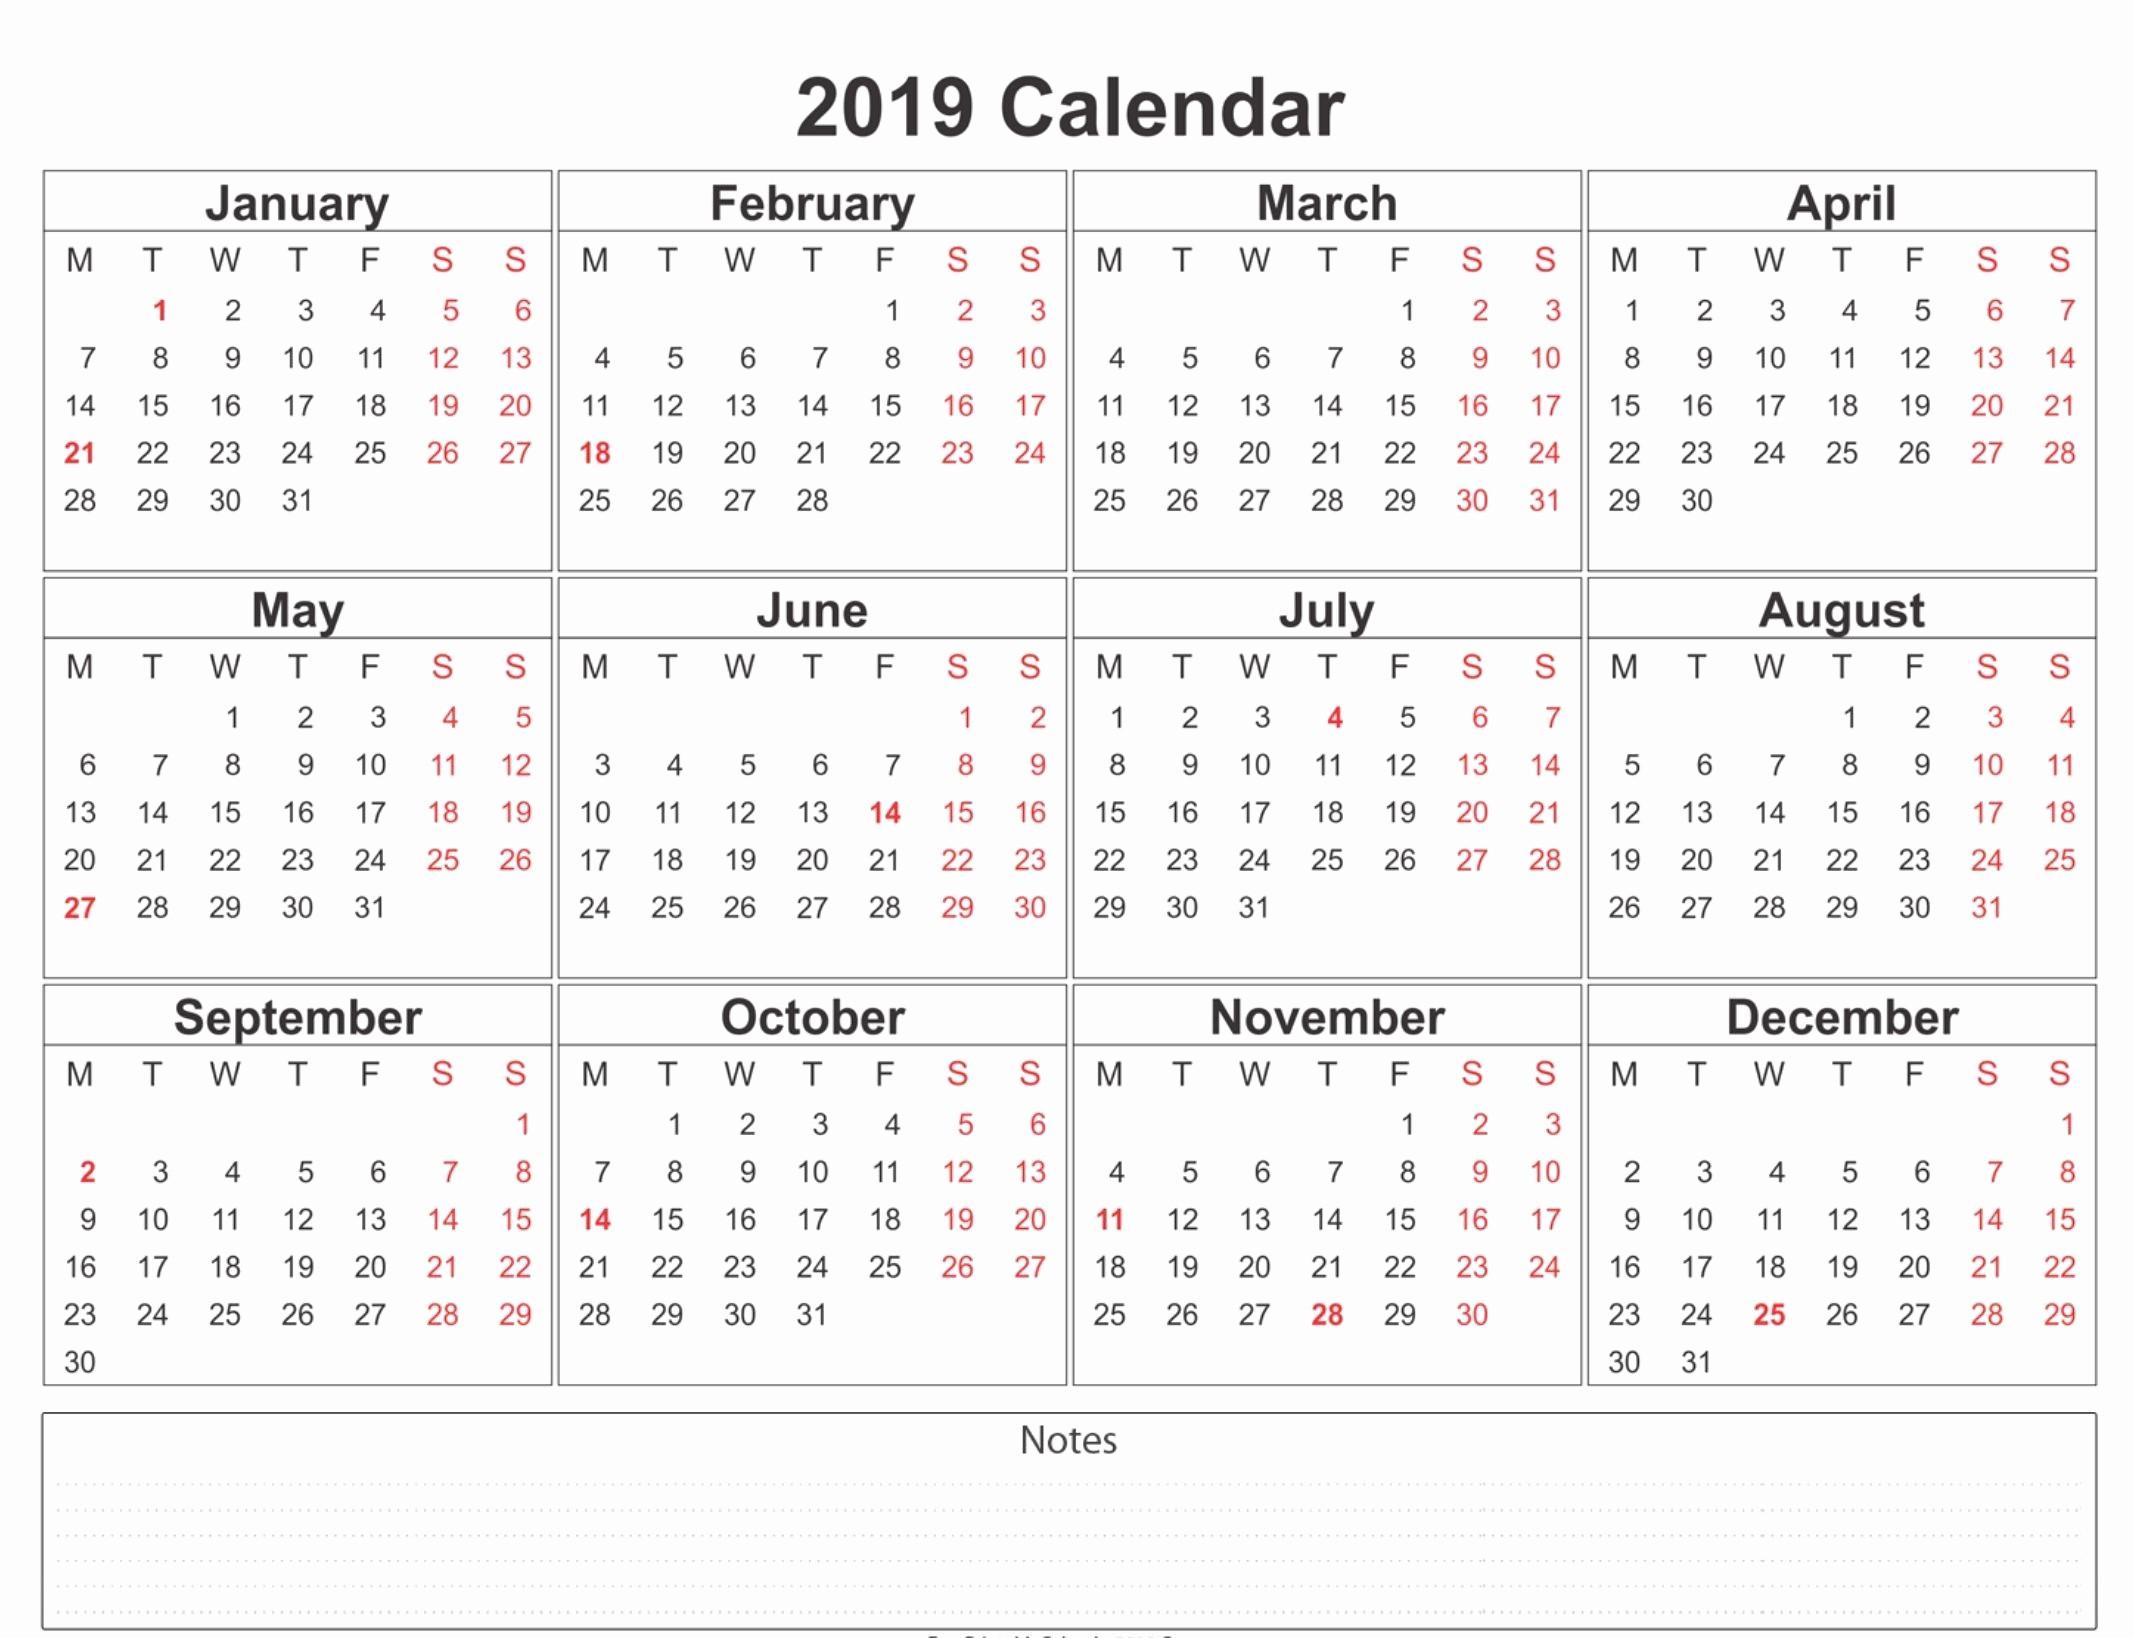 Free Printable Calendar Templates 2019 Inspirational 2019 Weekly Calendar Printable Calendar2019